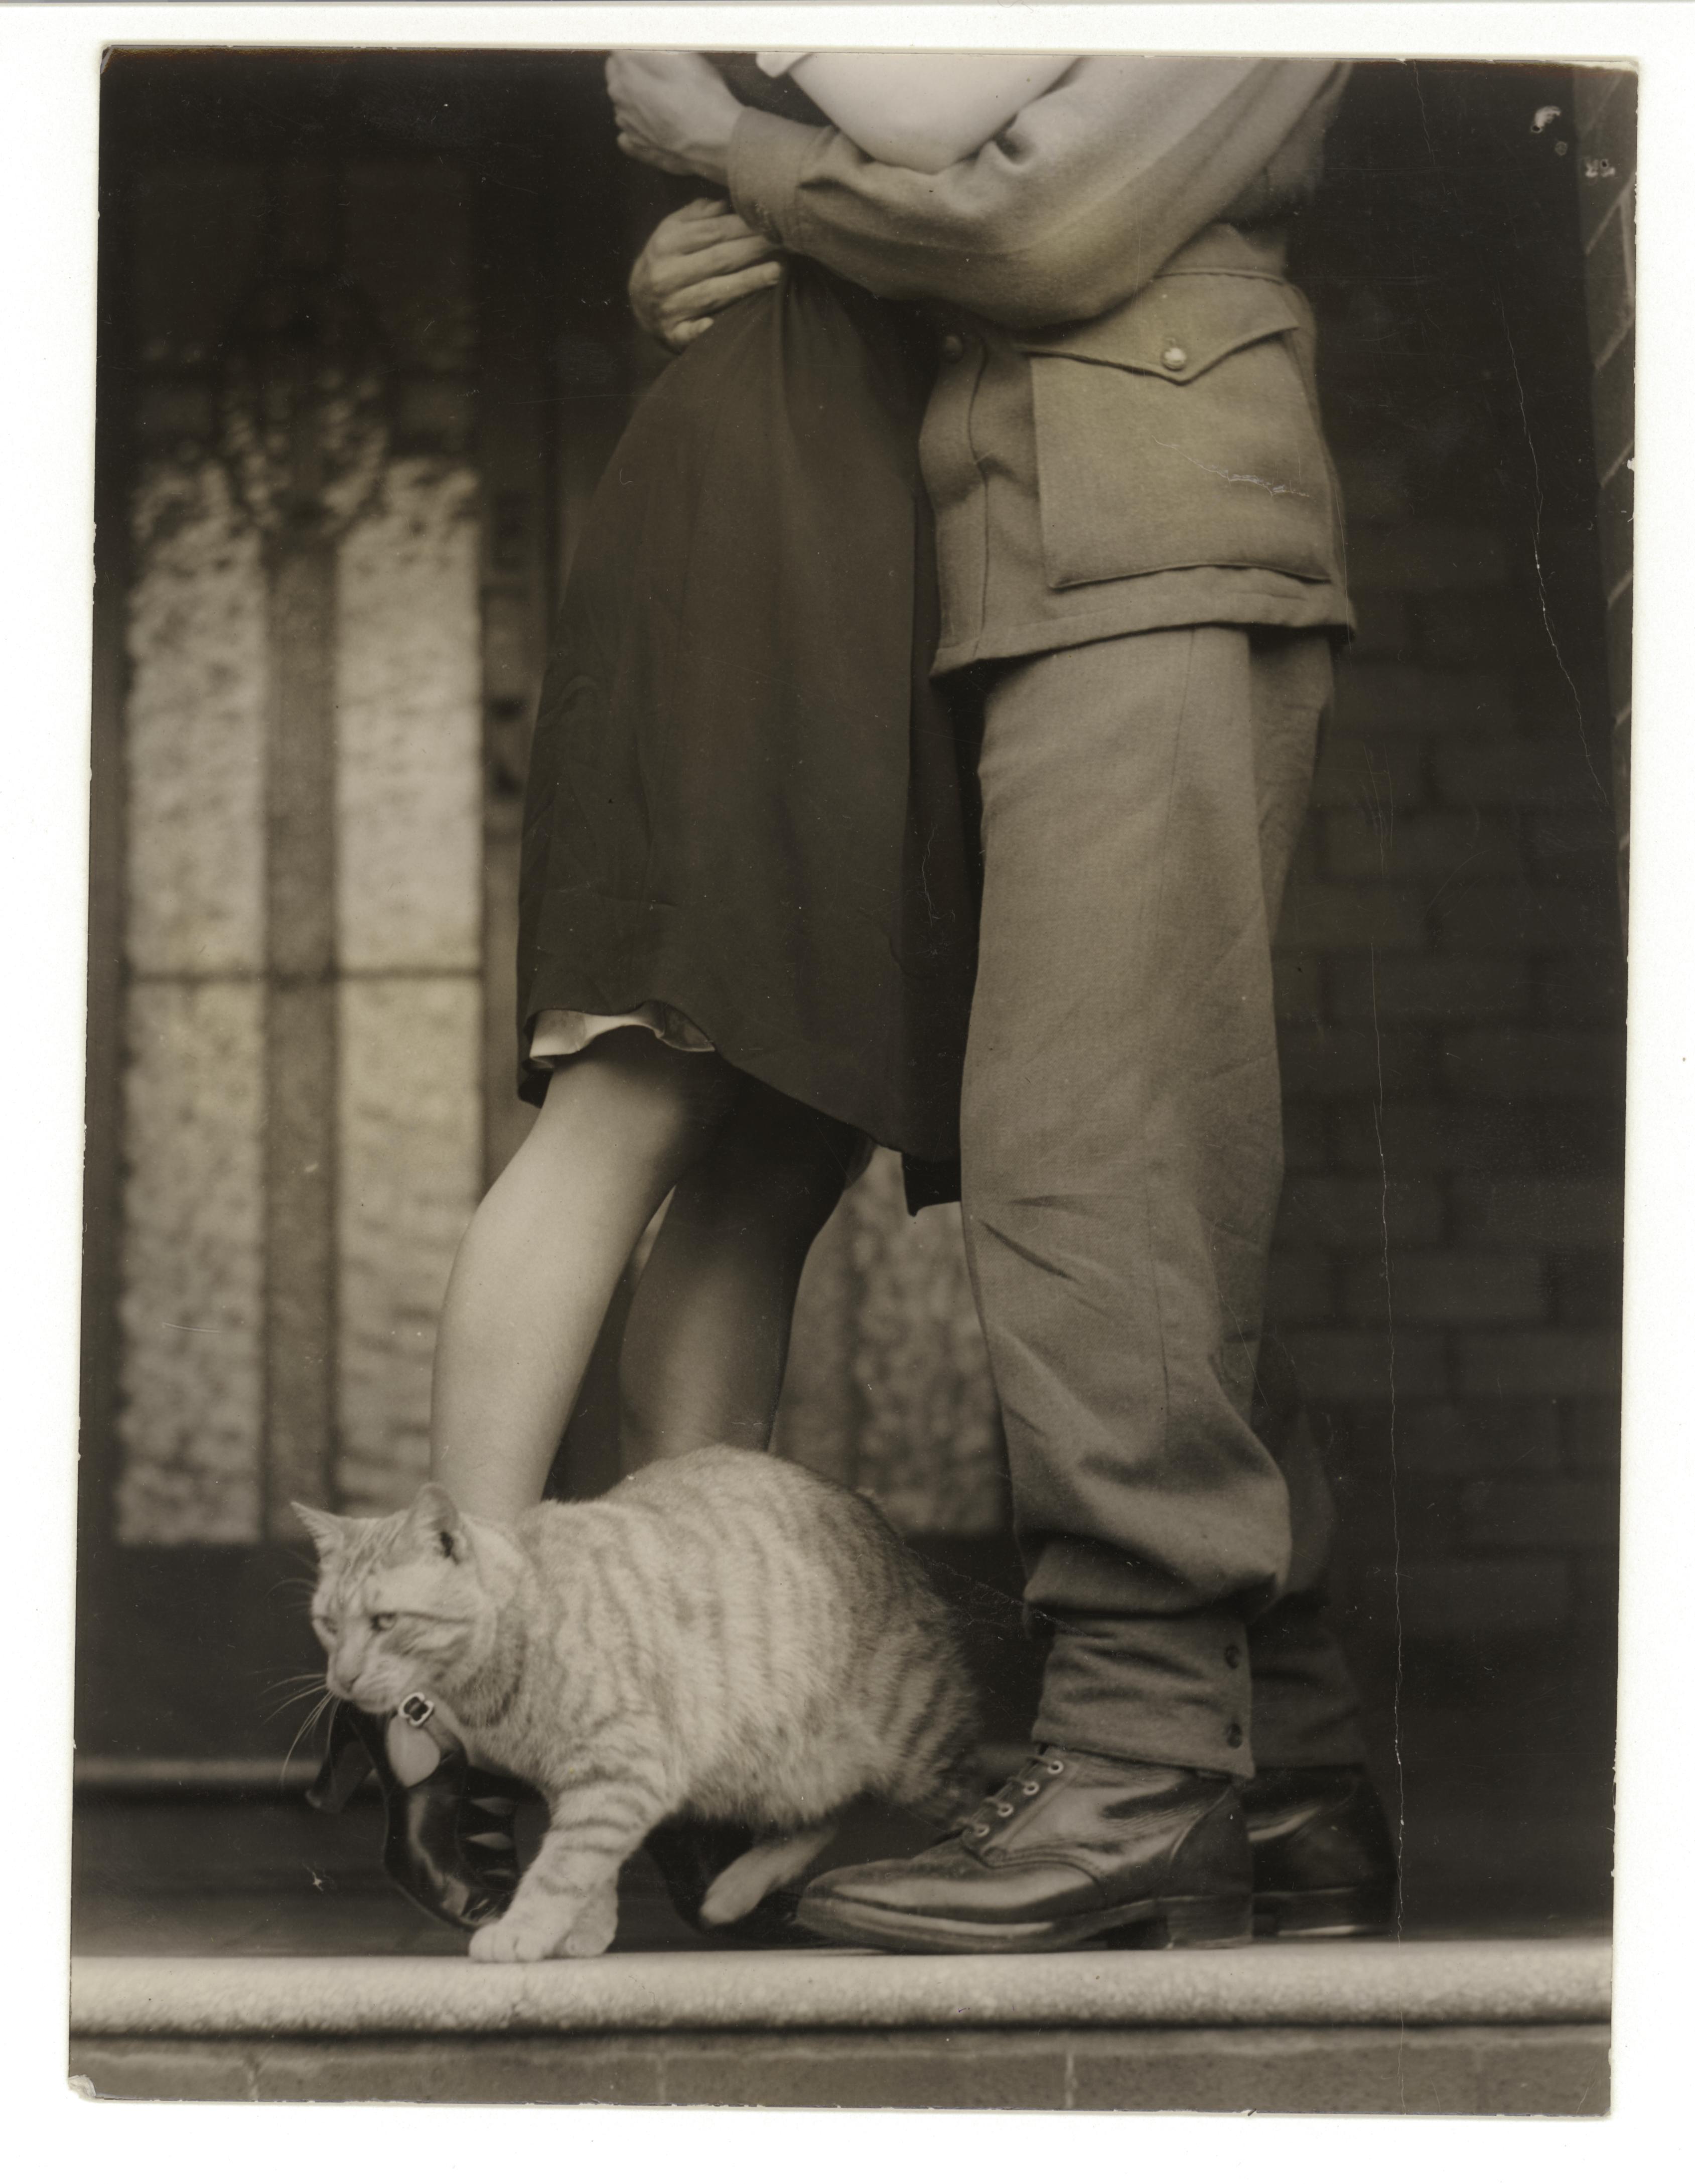 Soldier's goodbye & Bobbie the cat, ca. 1925-ca. 1945, Sam Hood